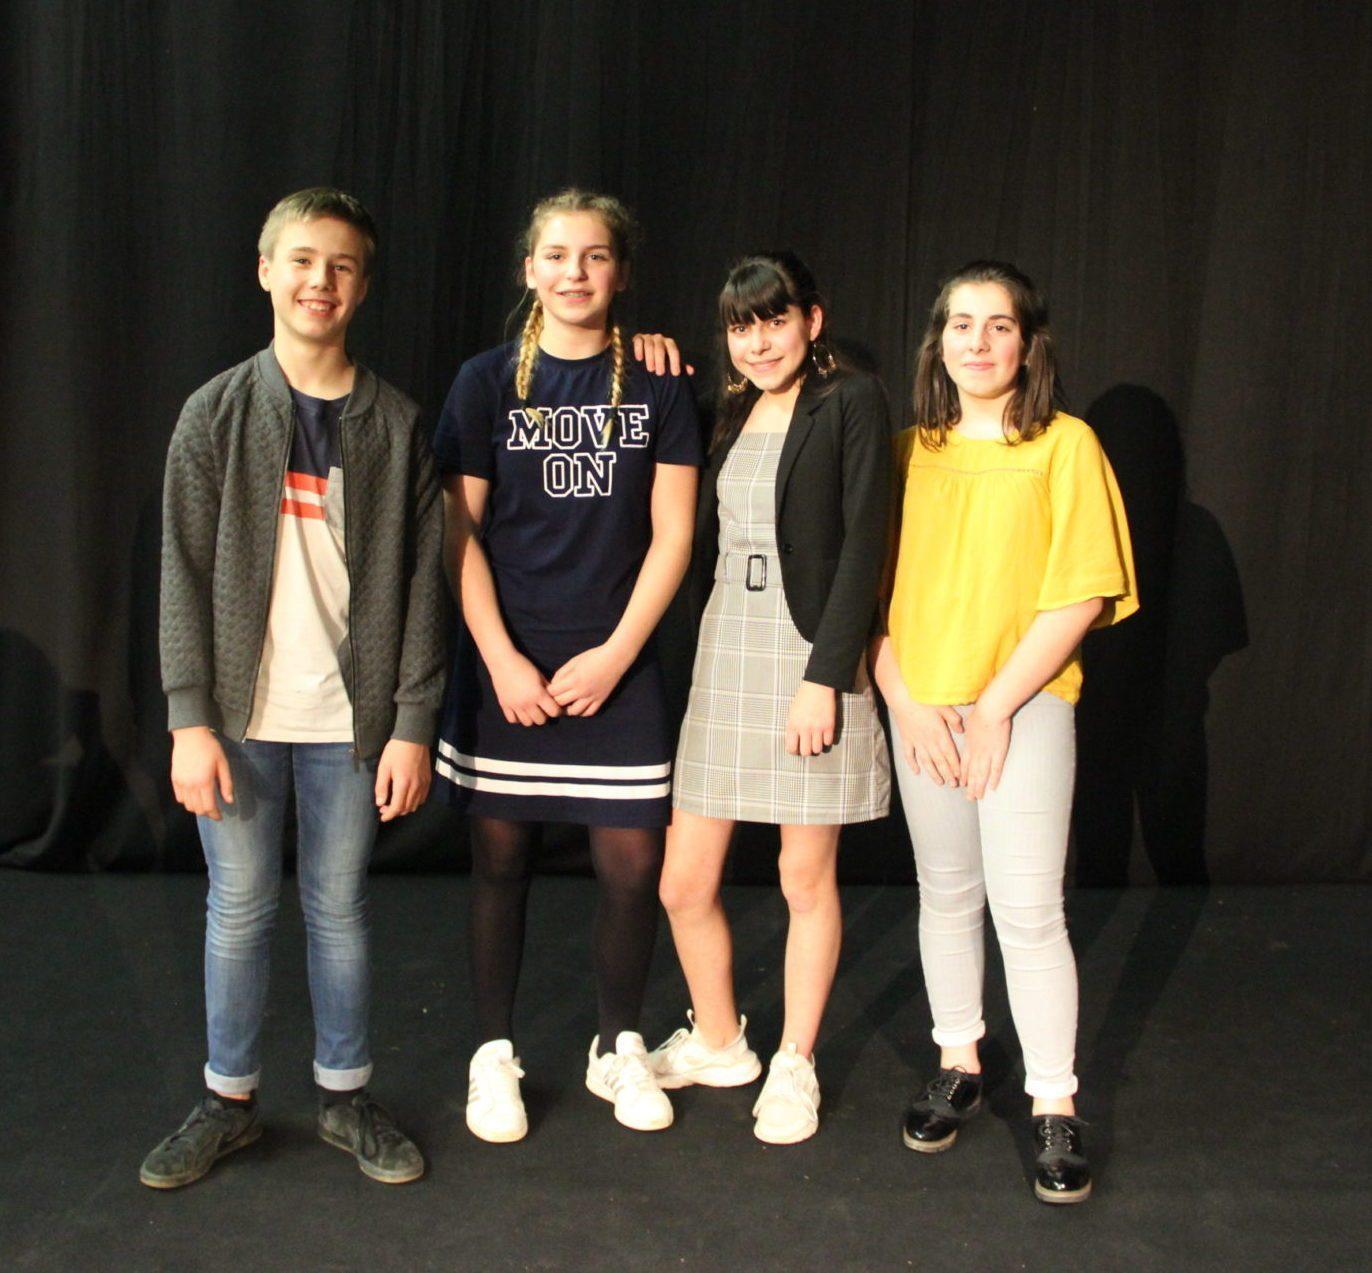 Les finalistes : Joachim, Lauralee, Morgane, Enora